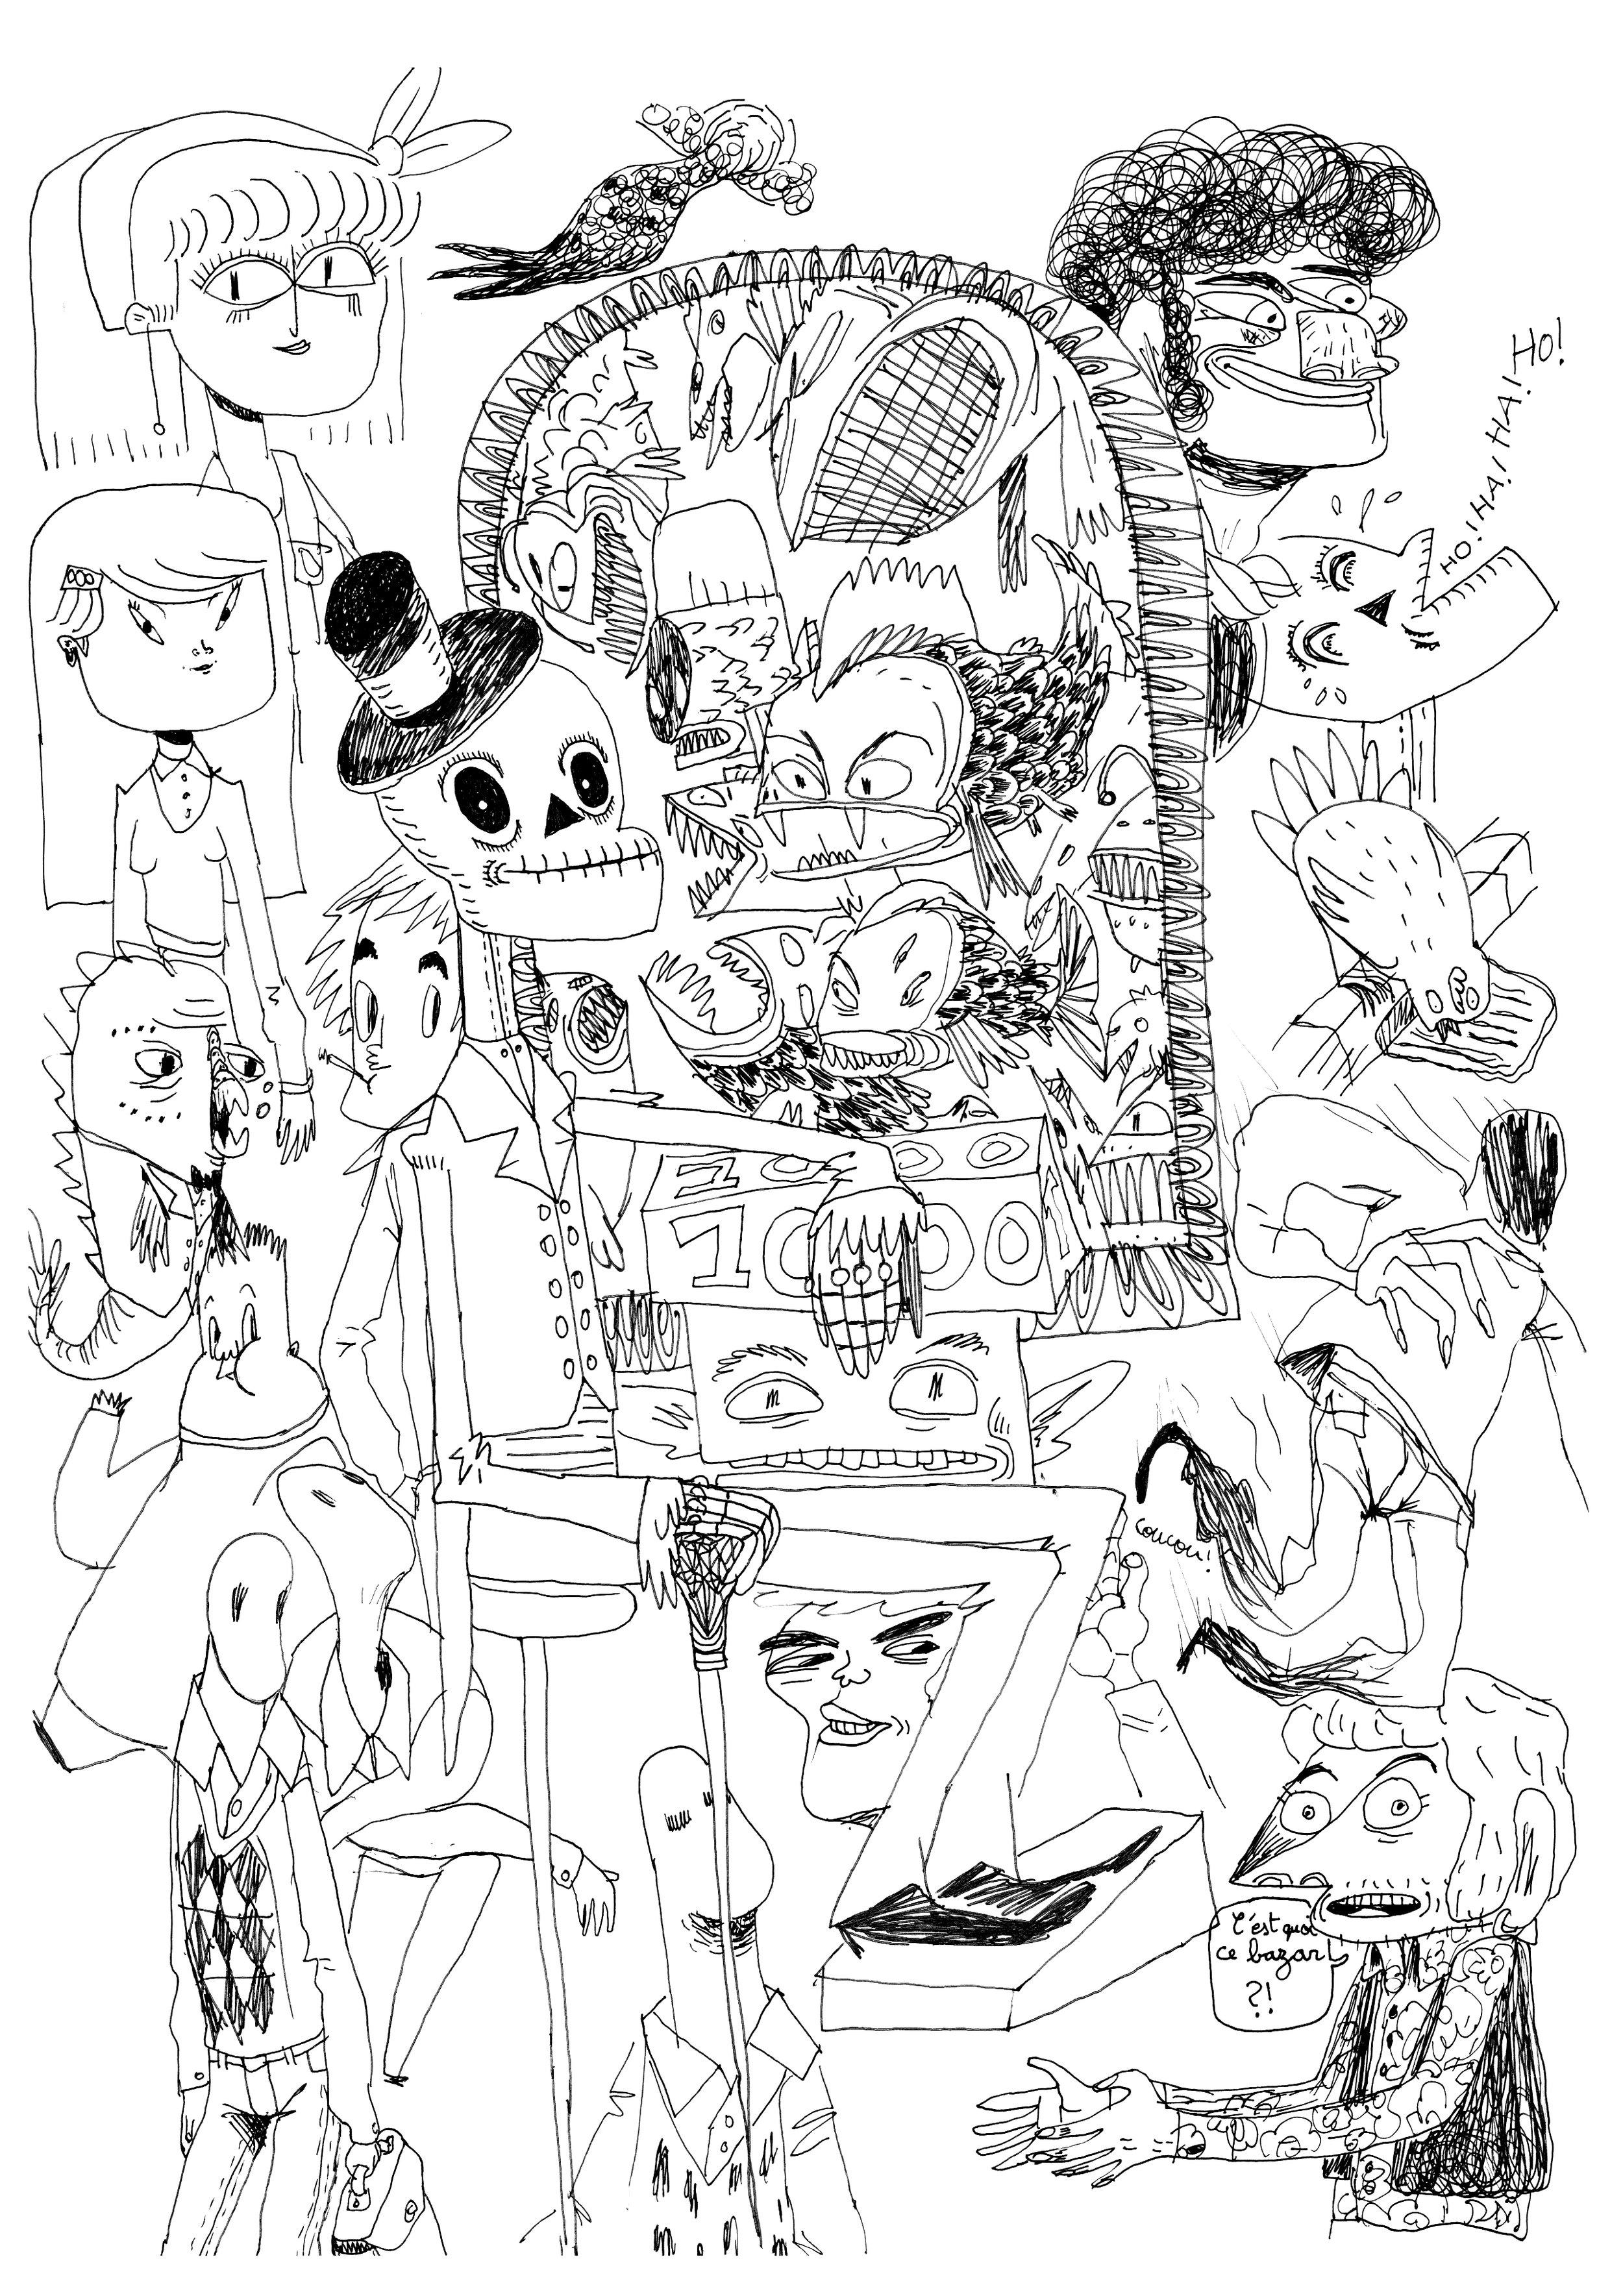 Pascal_Zaffiro_Doodle_31.jpg